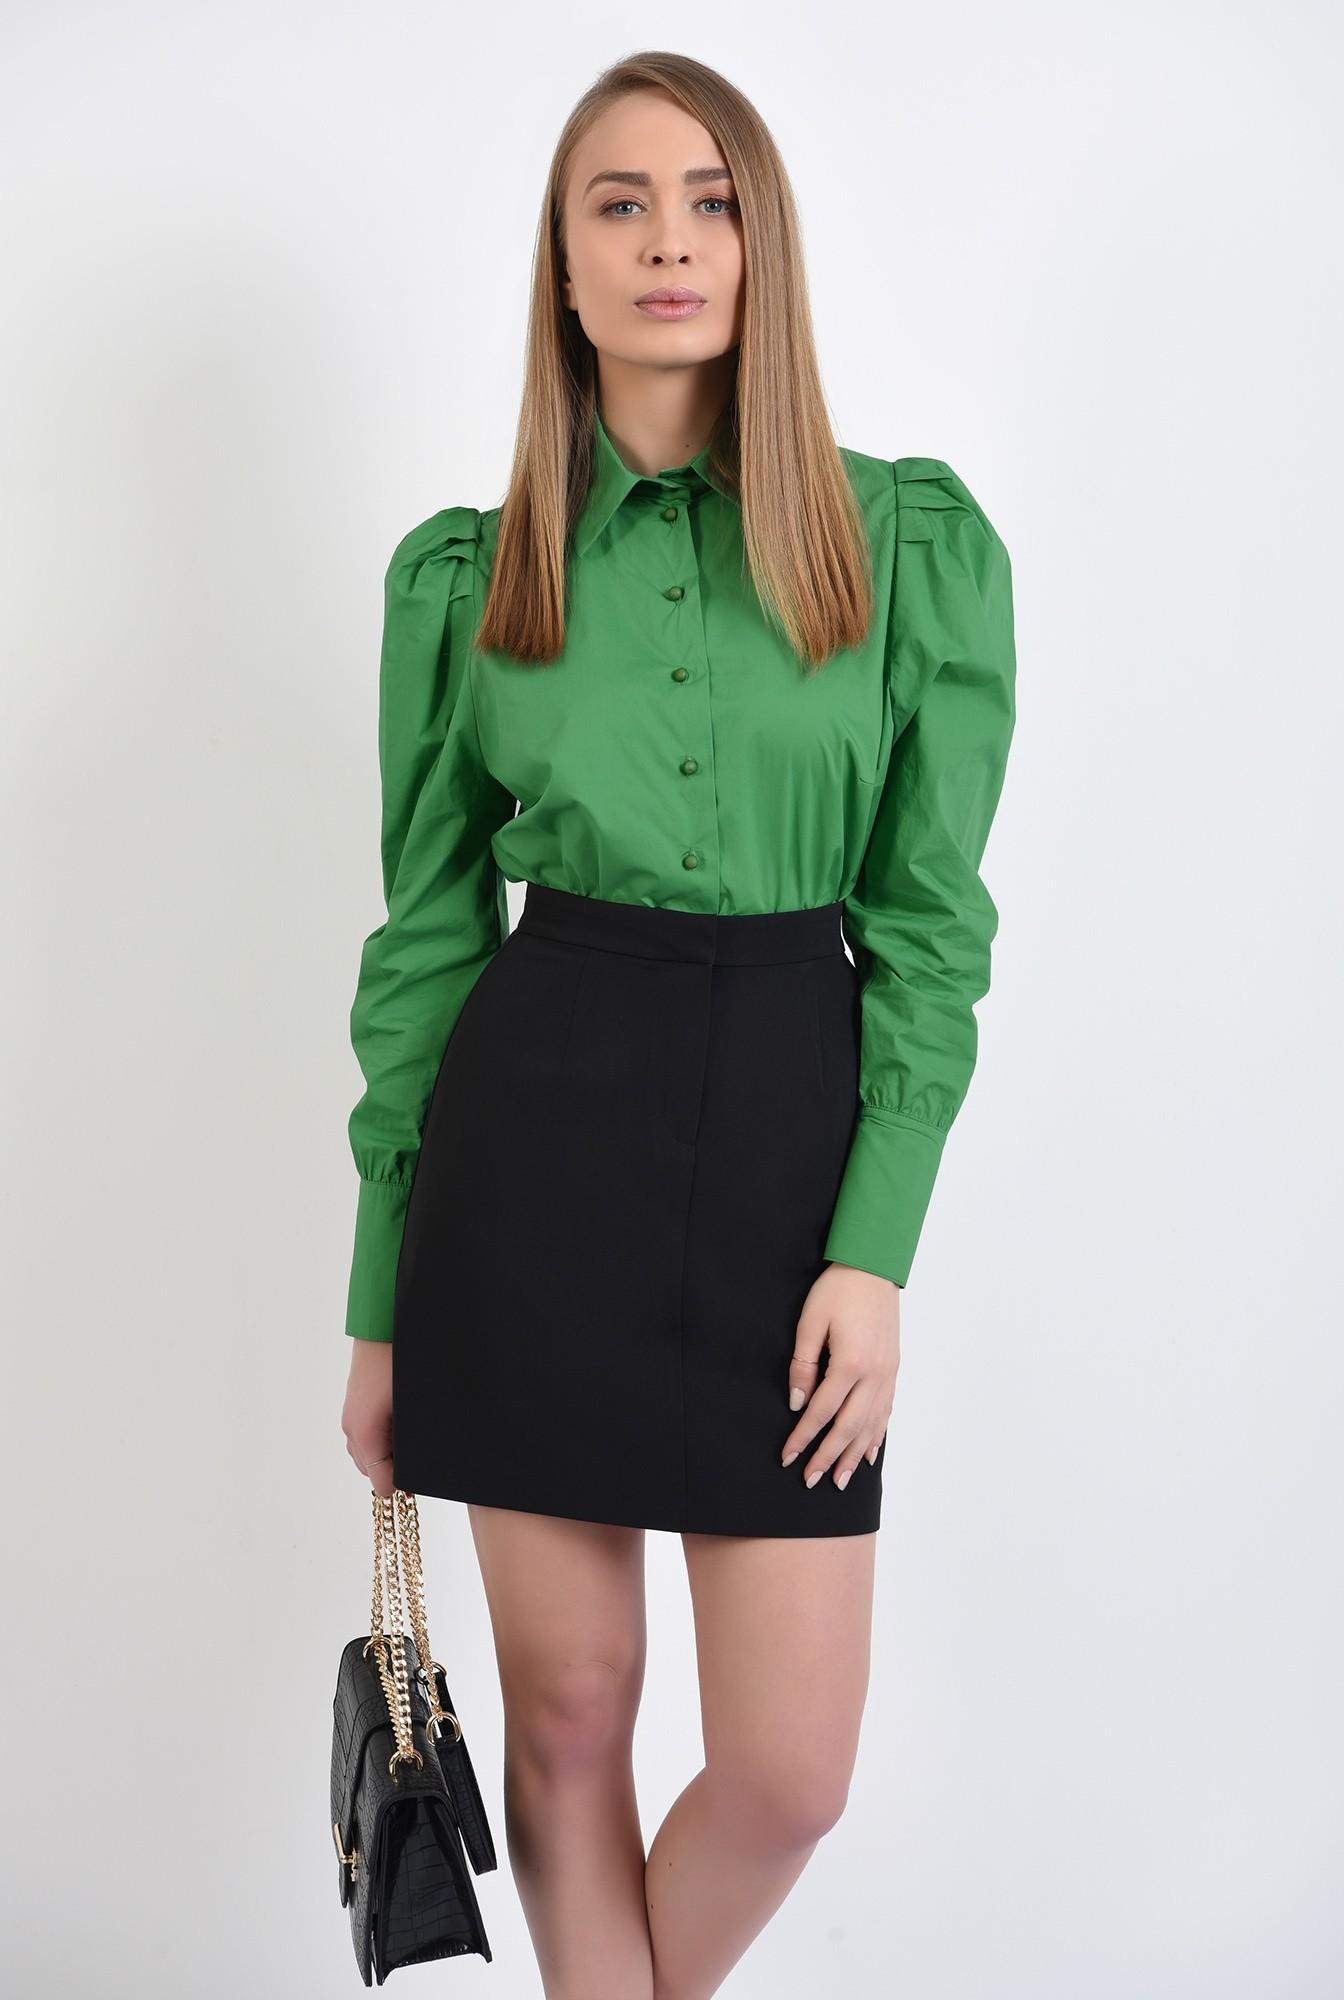 2 -  fusta mini, neagra, dreapta, cu talie inalta, fermoar in fata